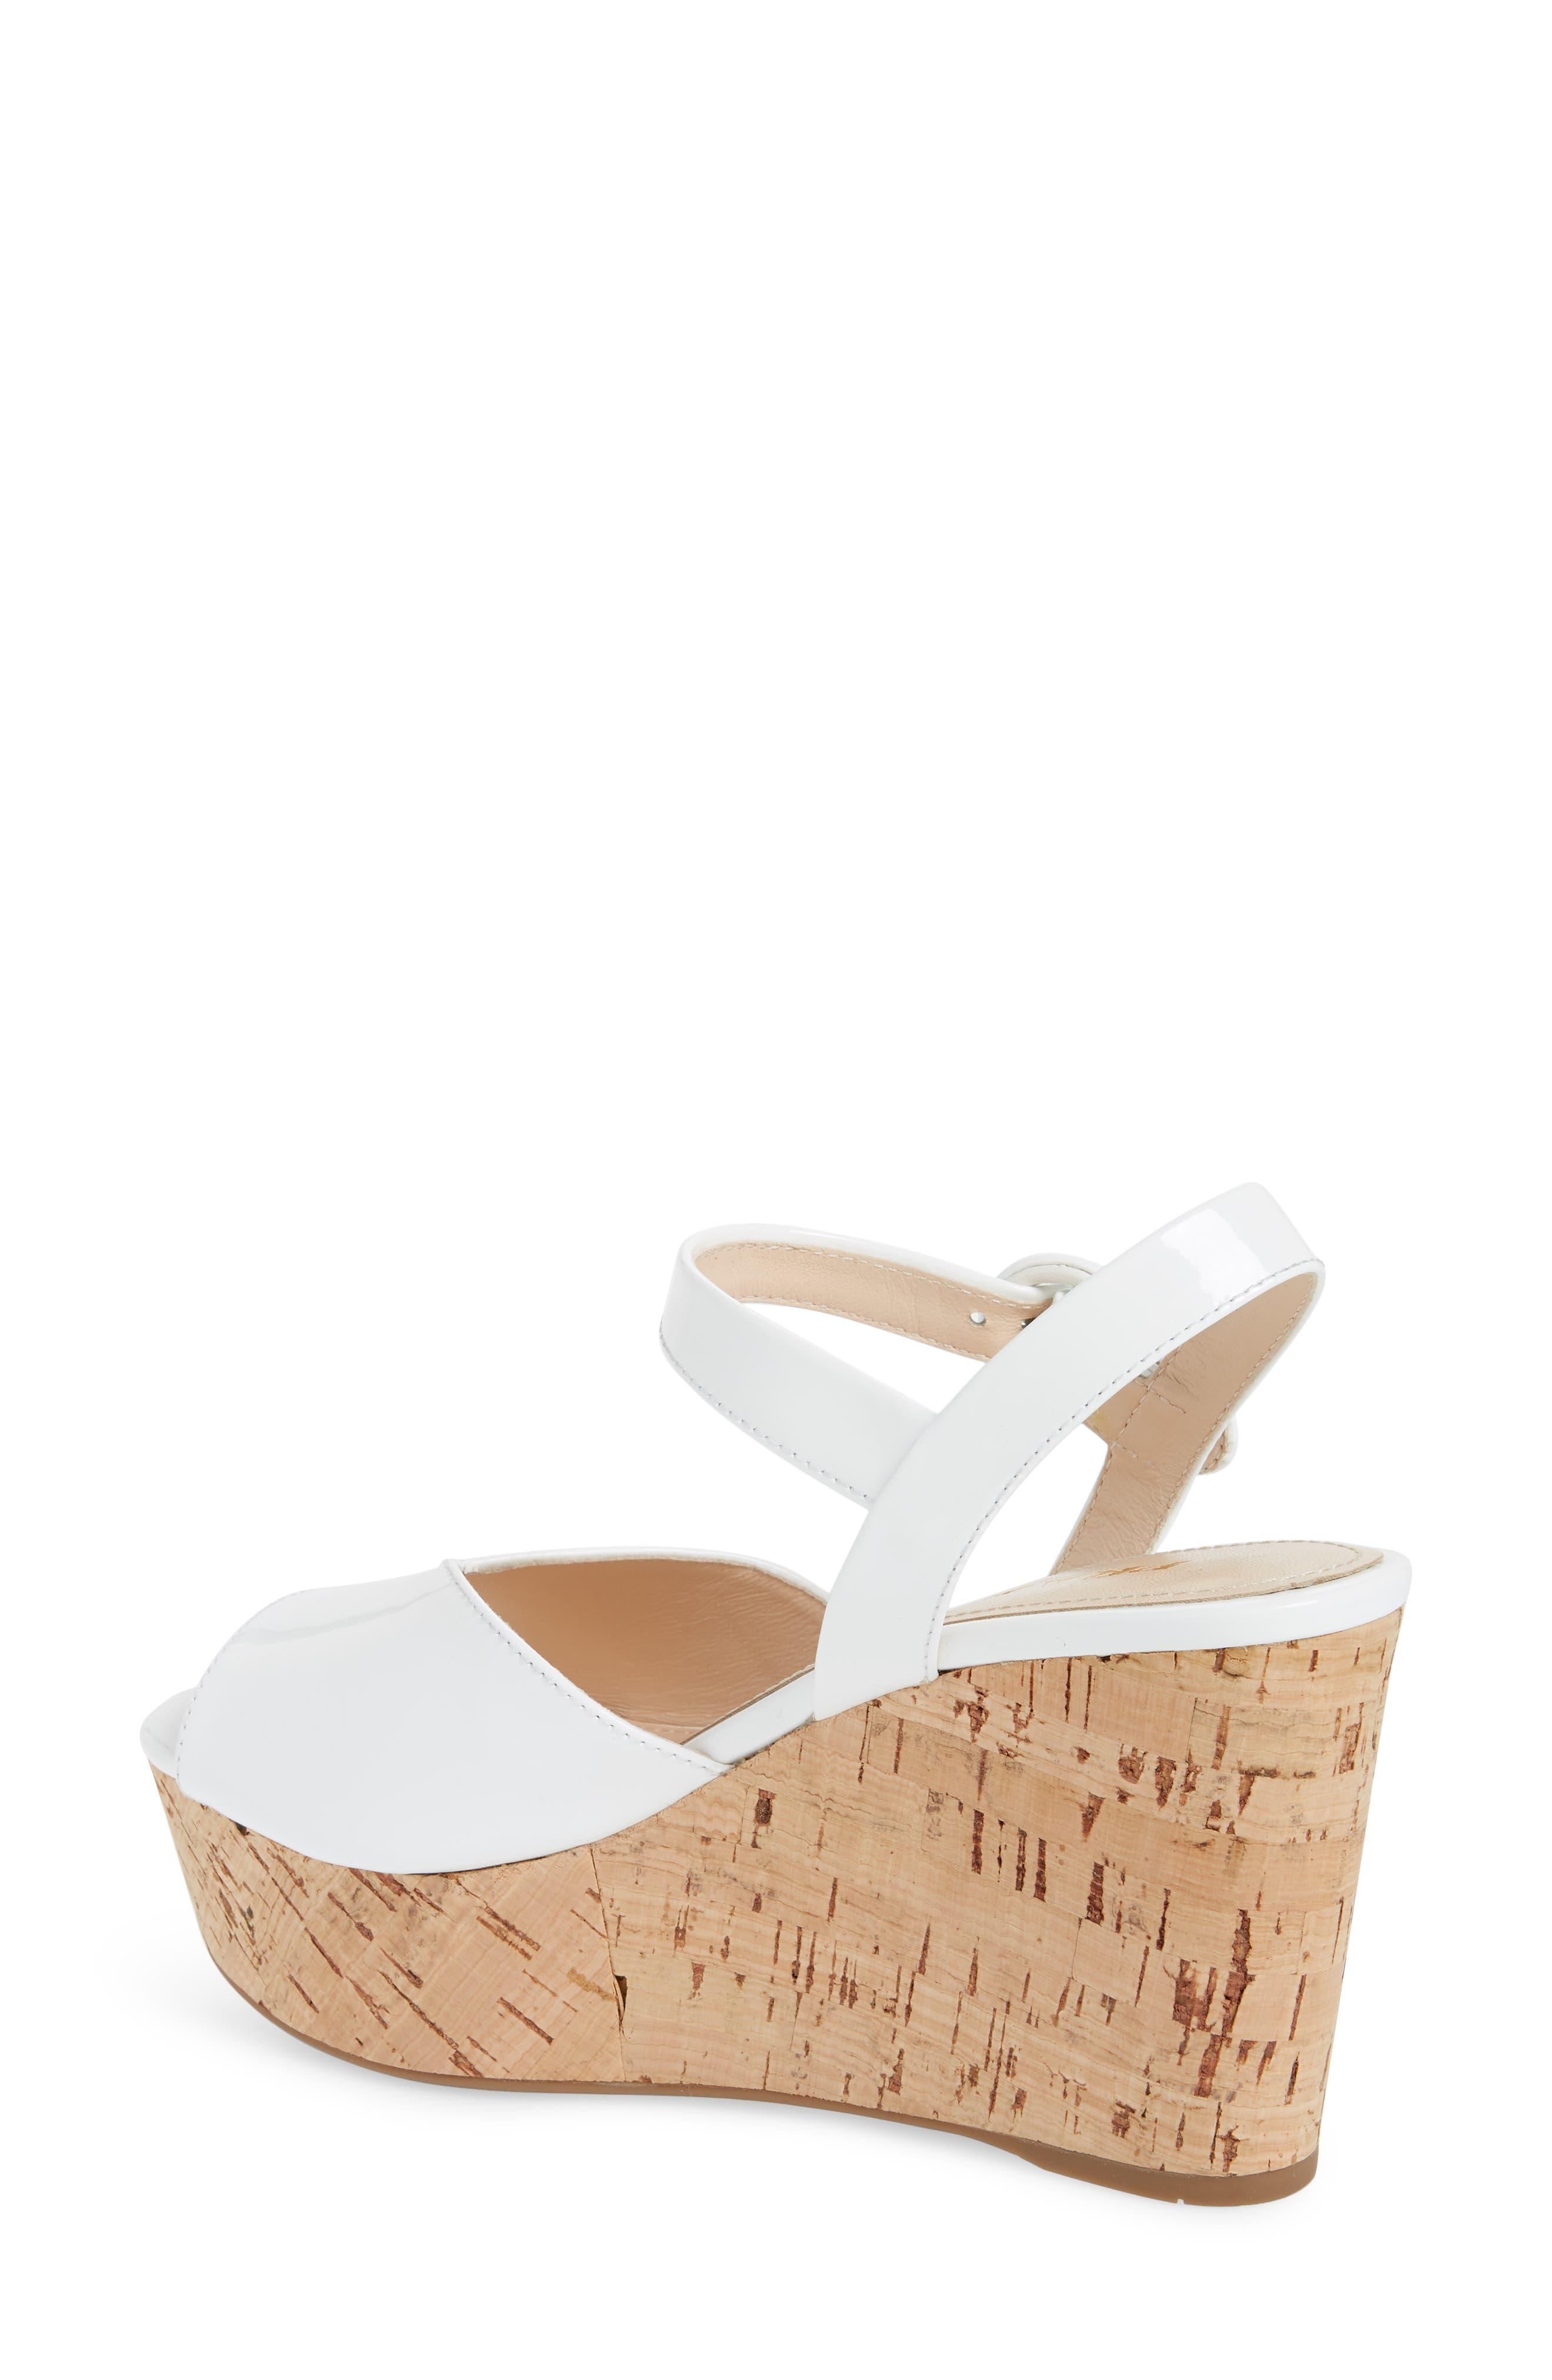 Wedge Platform Sandal,                             Alternate thumbnail 2, color,                             WHITE PATENT